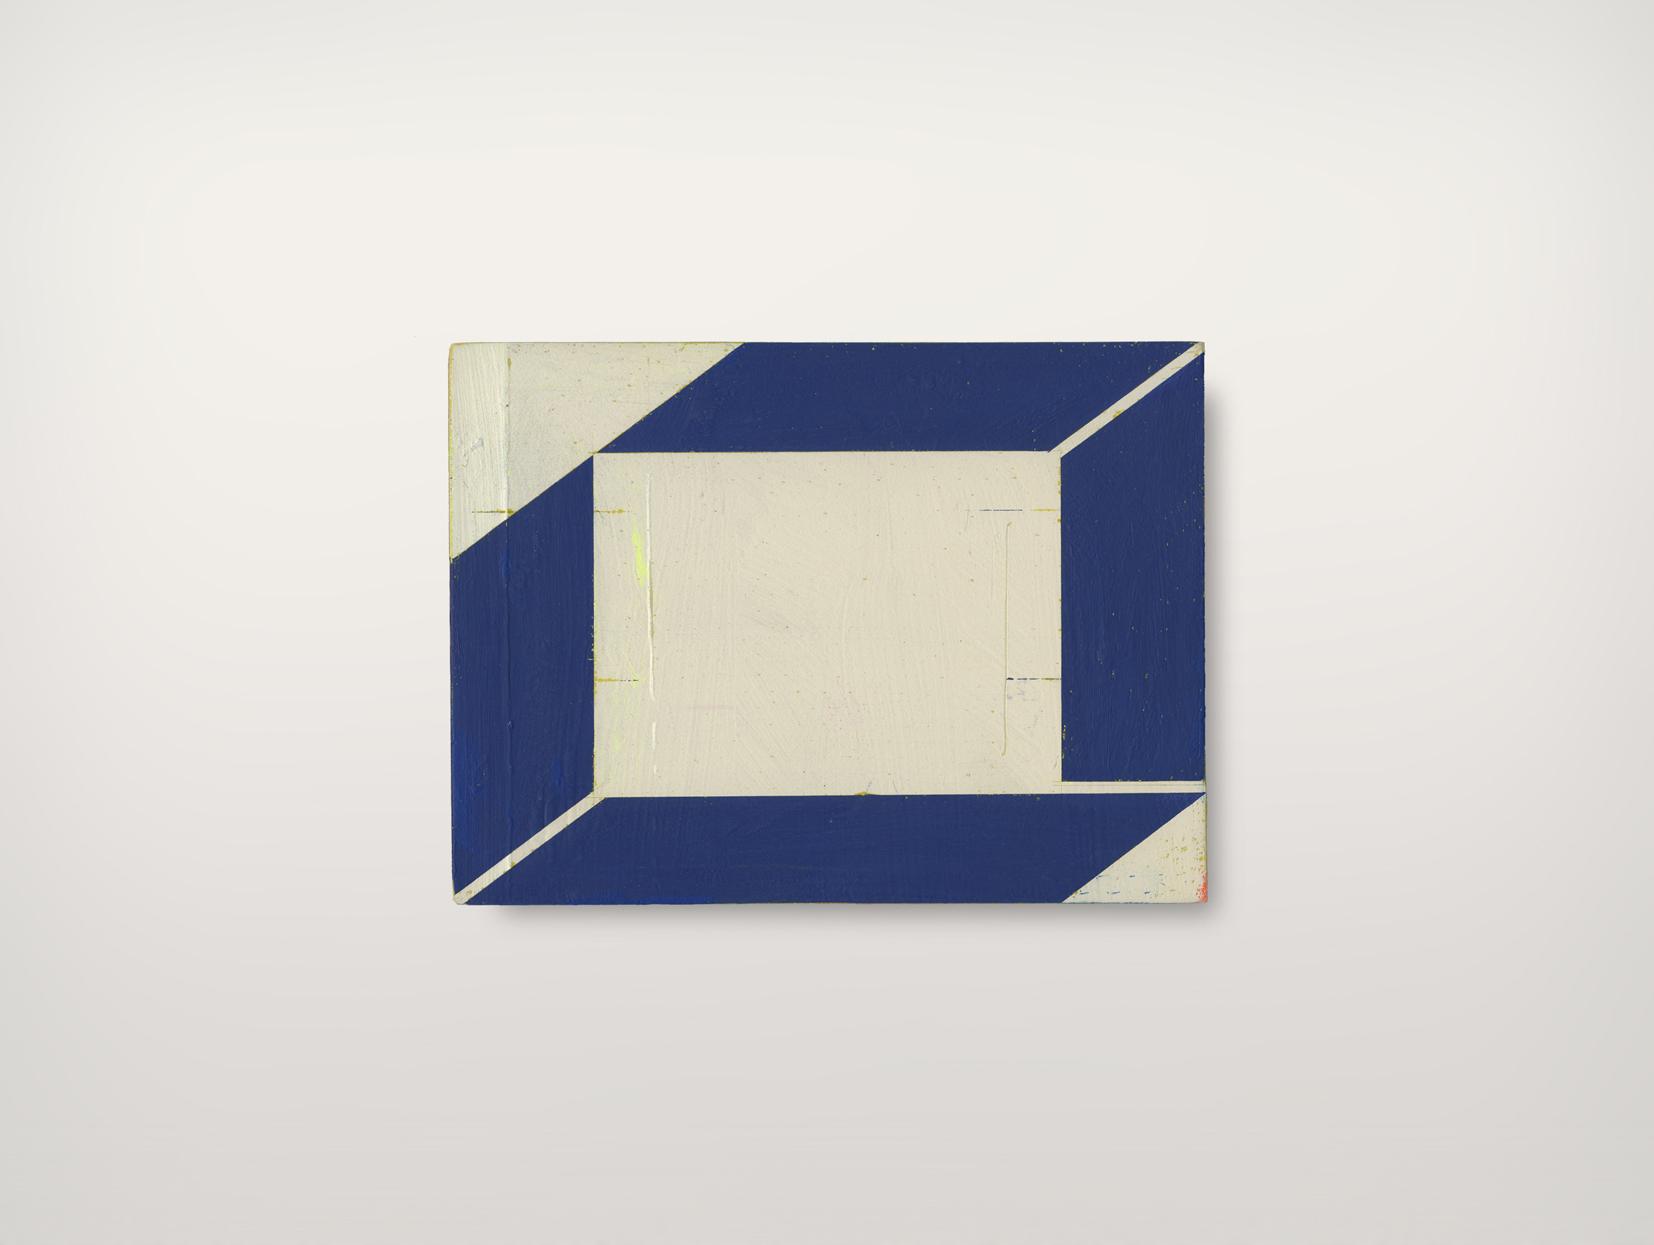 Untitled (625-3)